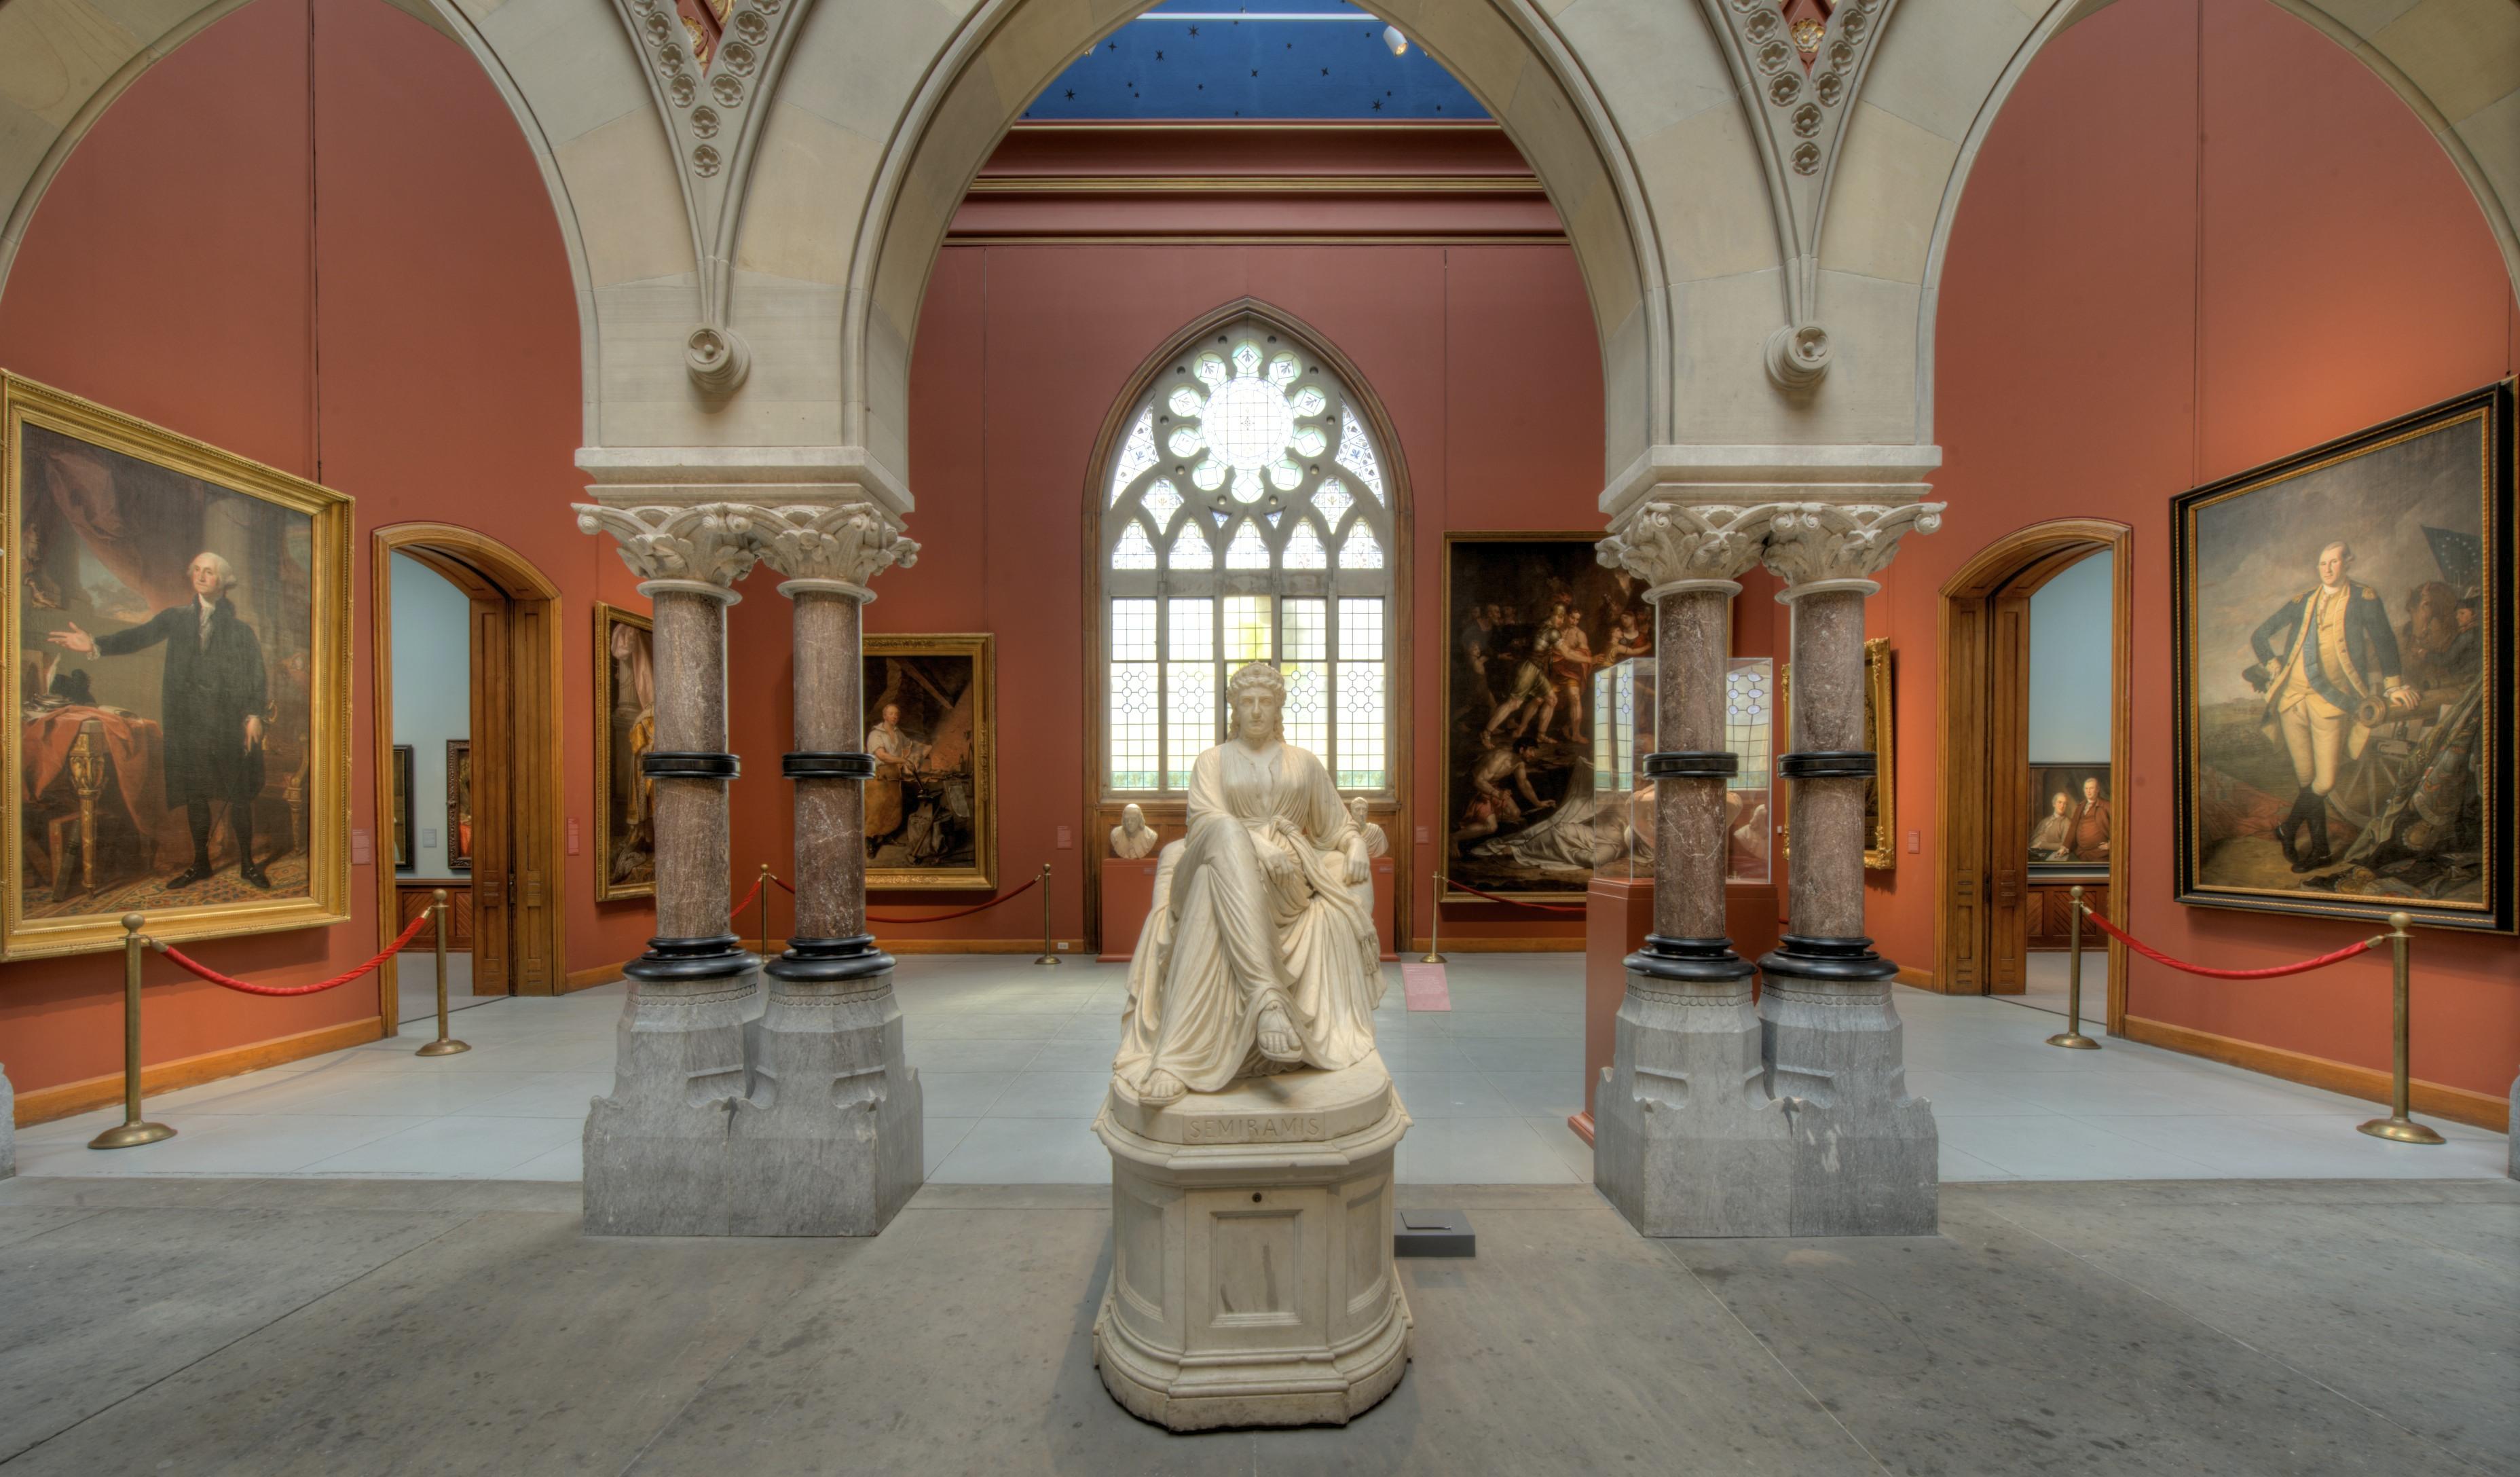 Art For Foyer : File pennsylvania academy of fine arts washington foyer g